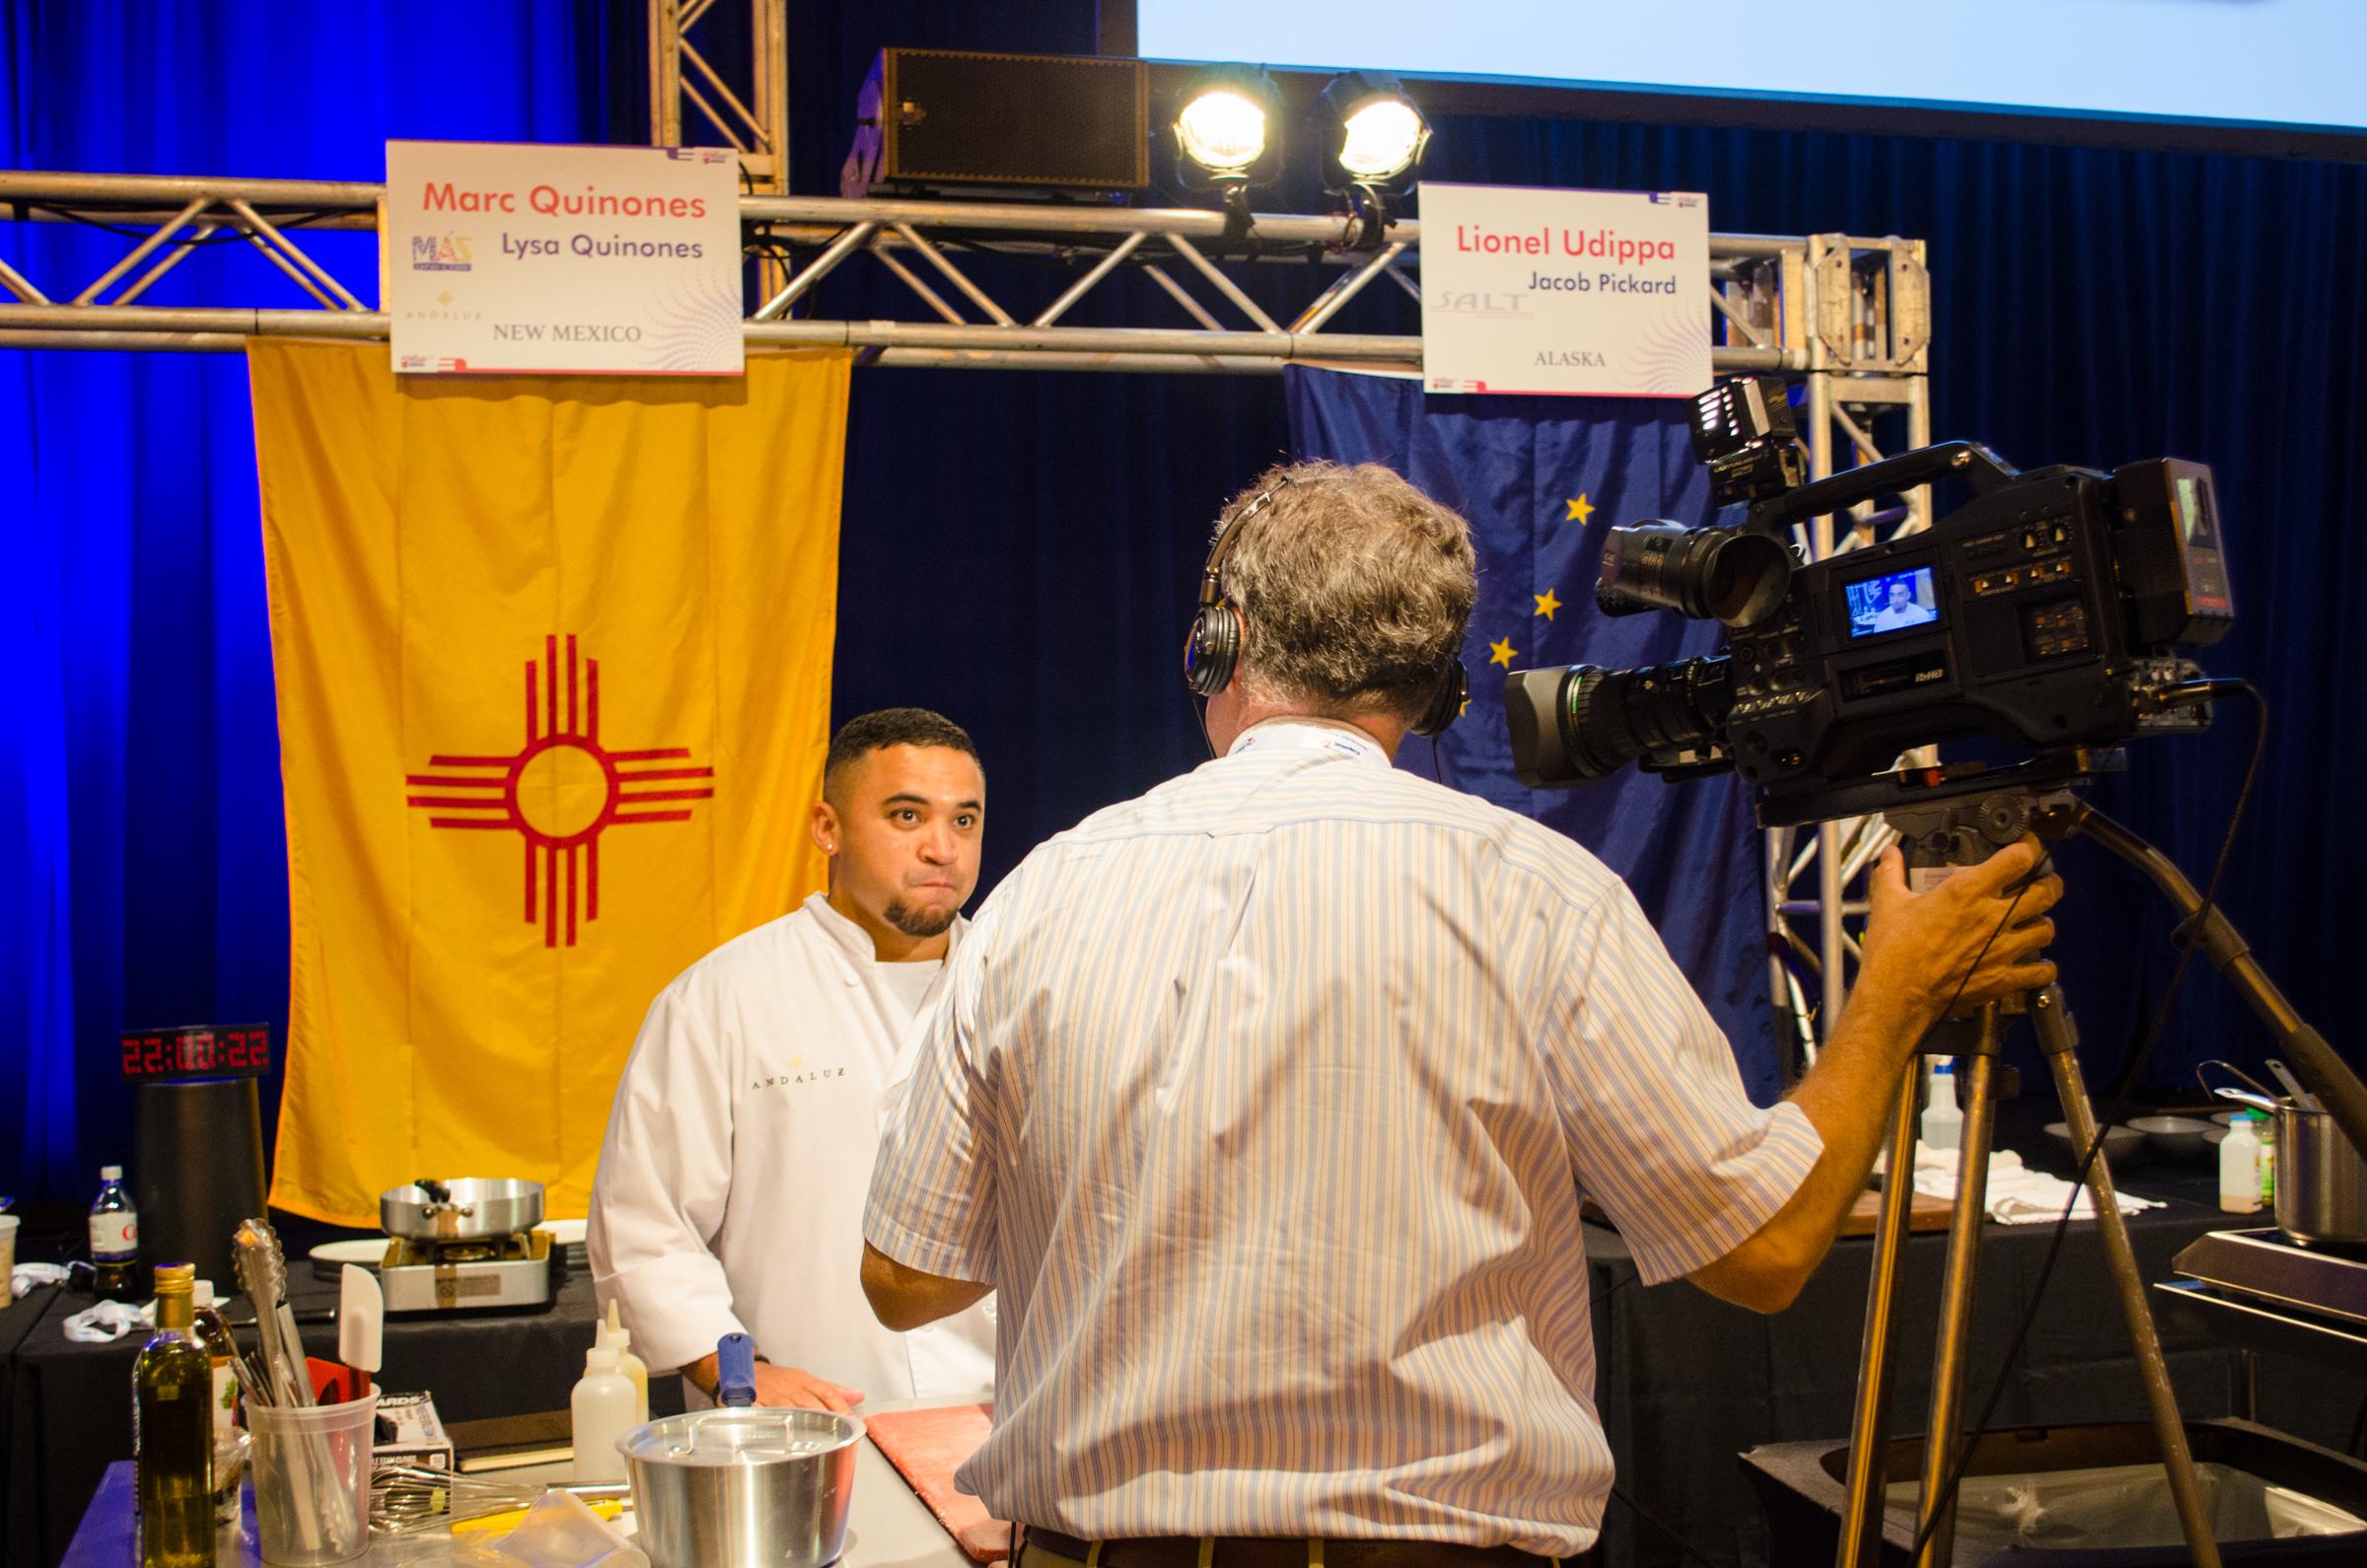 Chef Marc Quionenes - Mas Tapas y Vine - Albuquerque, NM